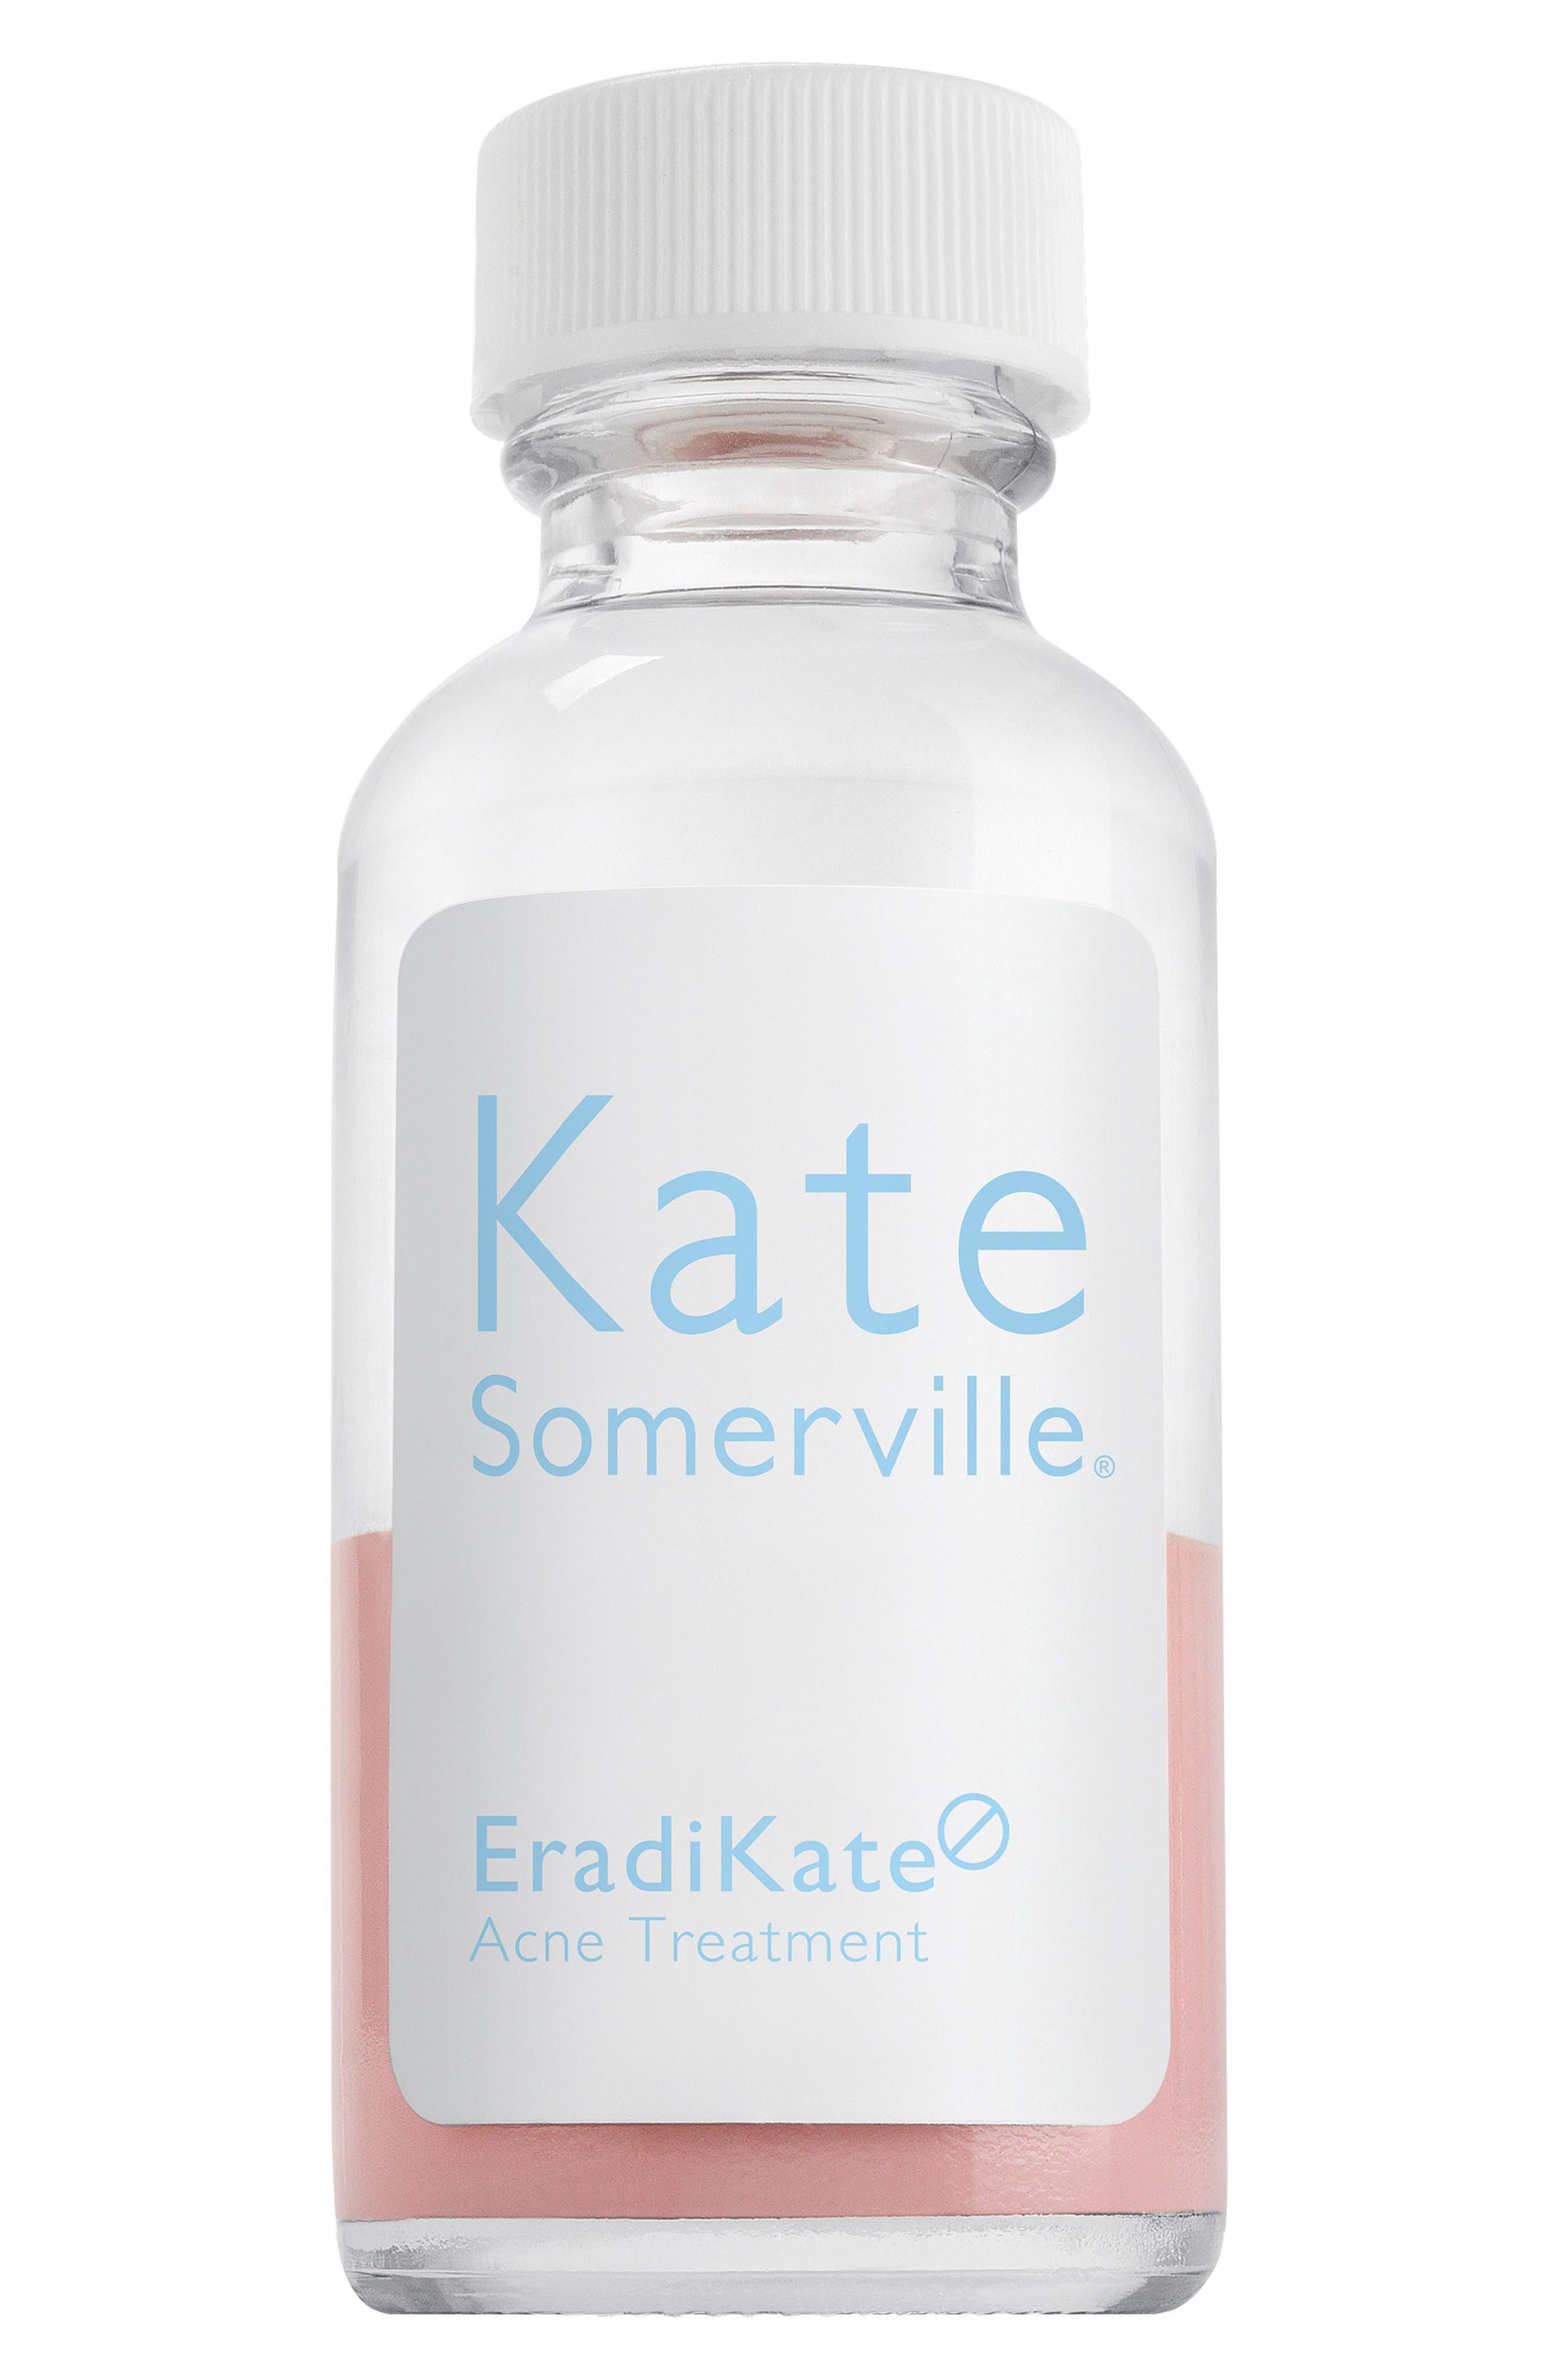 Kate Somerville® 'EradiKate' Acne Treatment